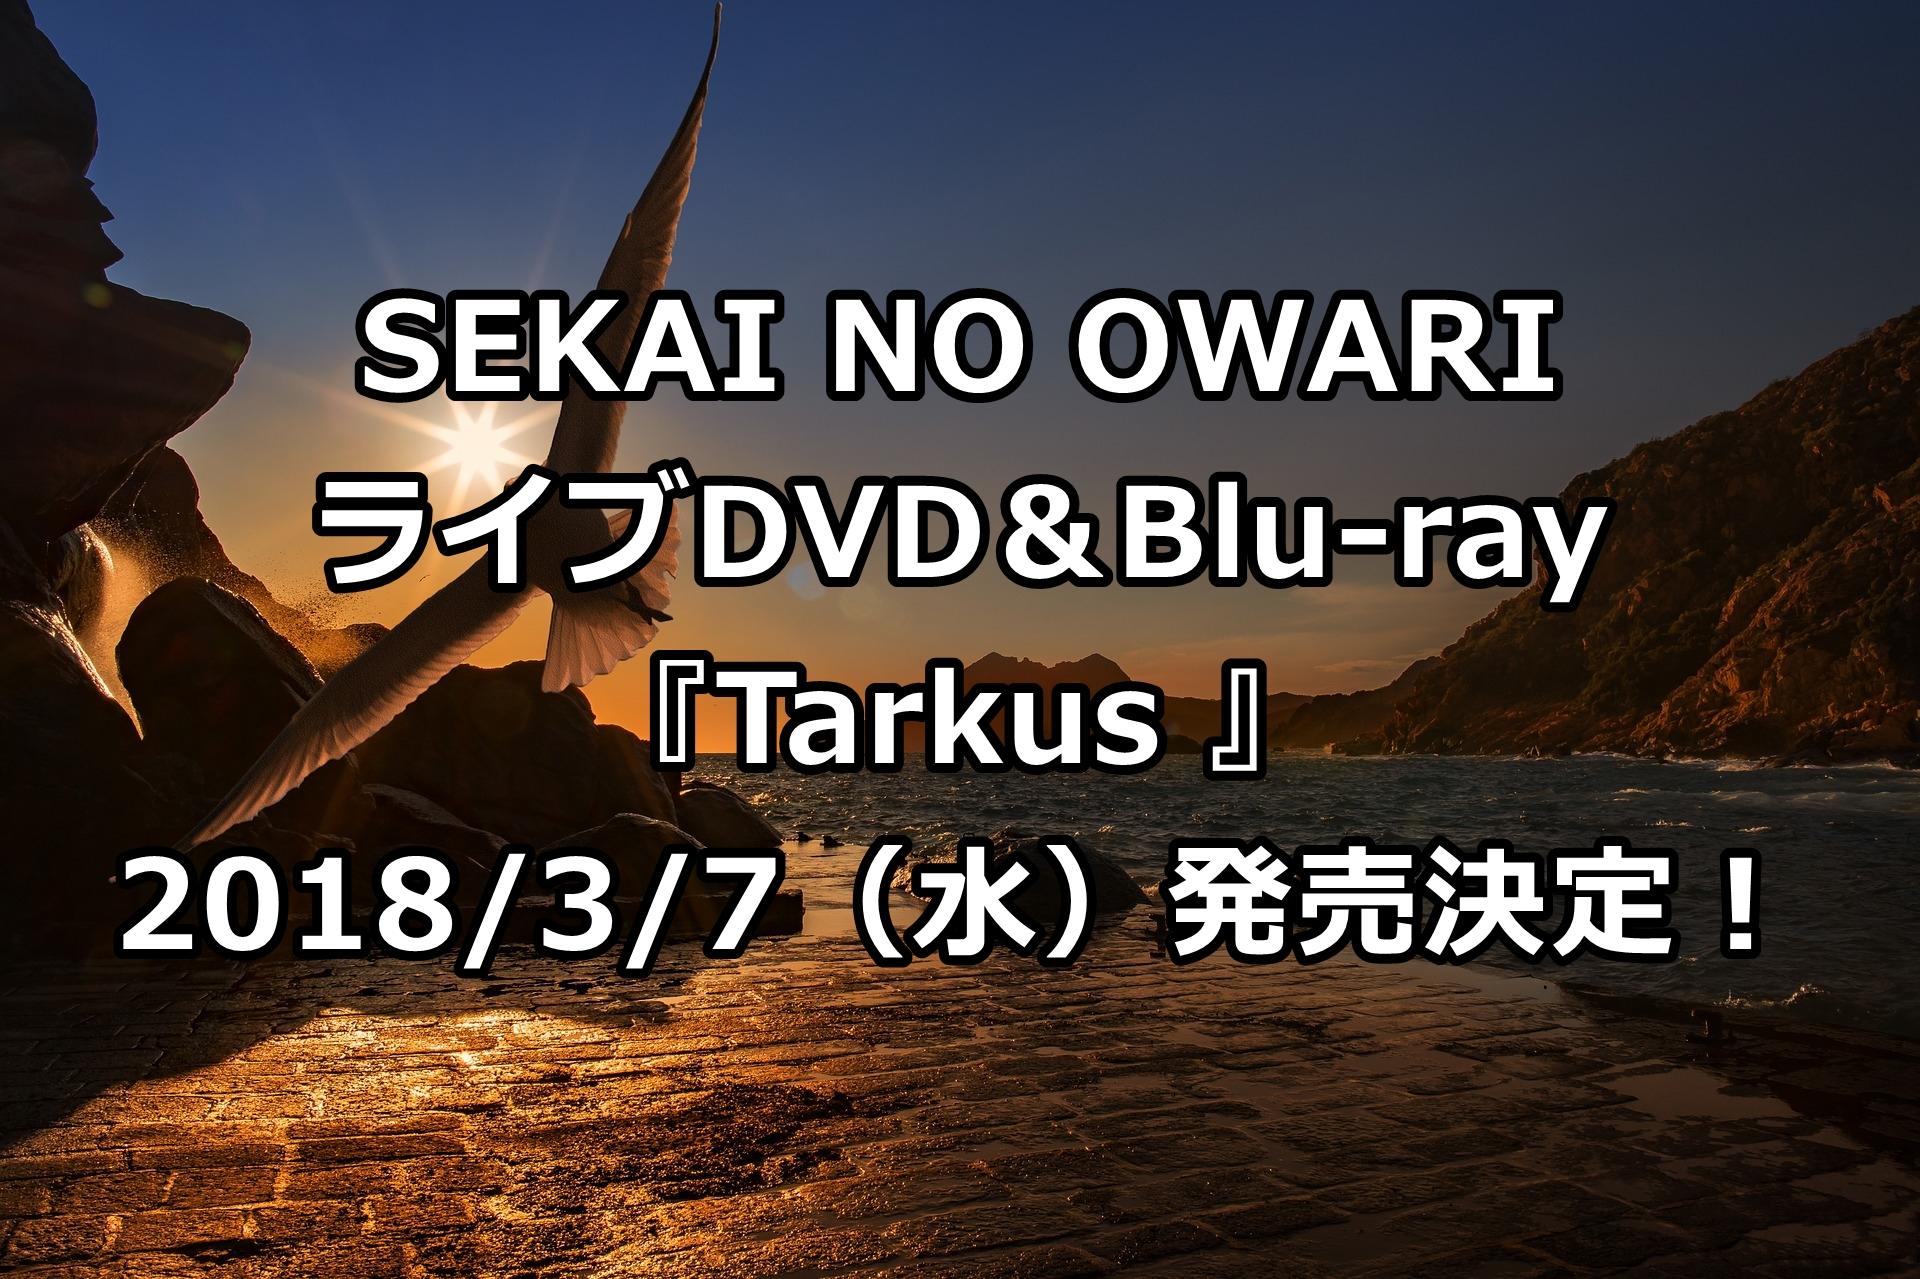 SEKAI NO OWARIライブDVD予約・特典案内!最新「Tarkus 」収録曲、最安値など徹底解説